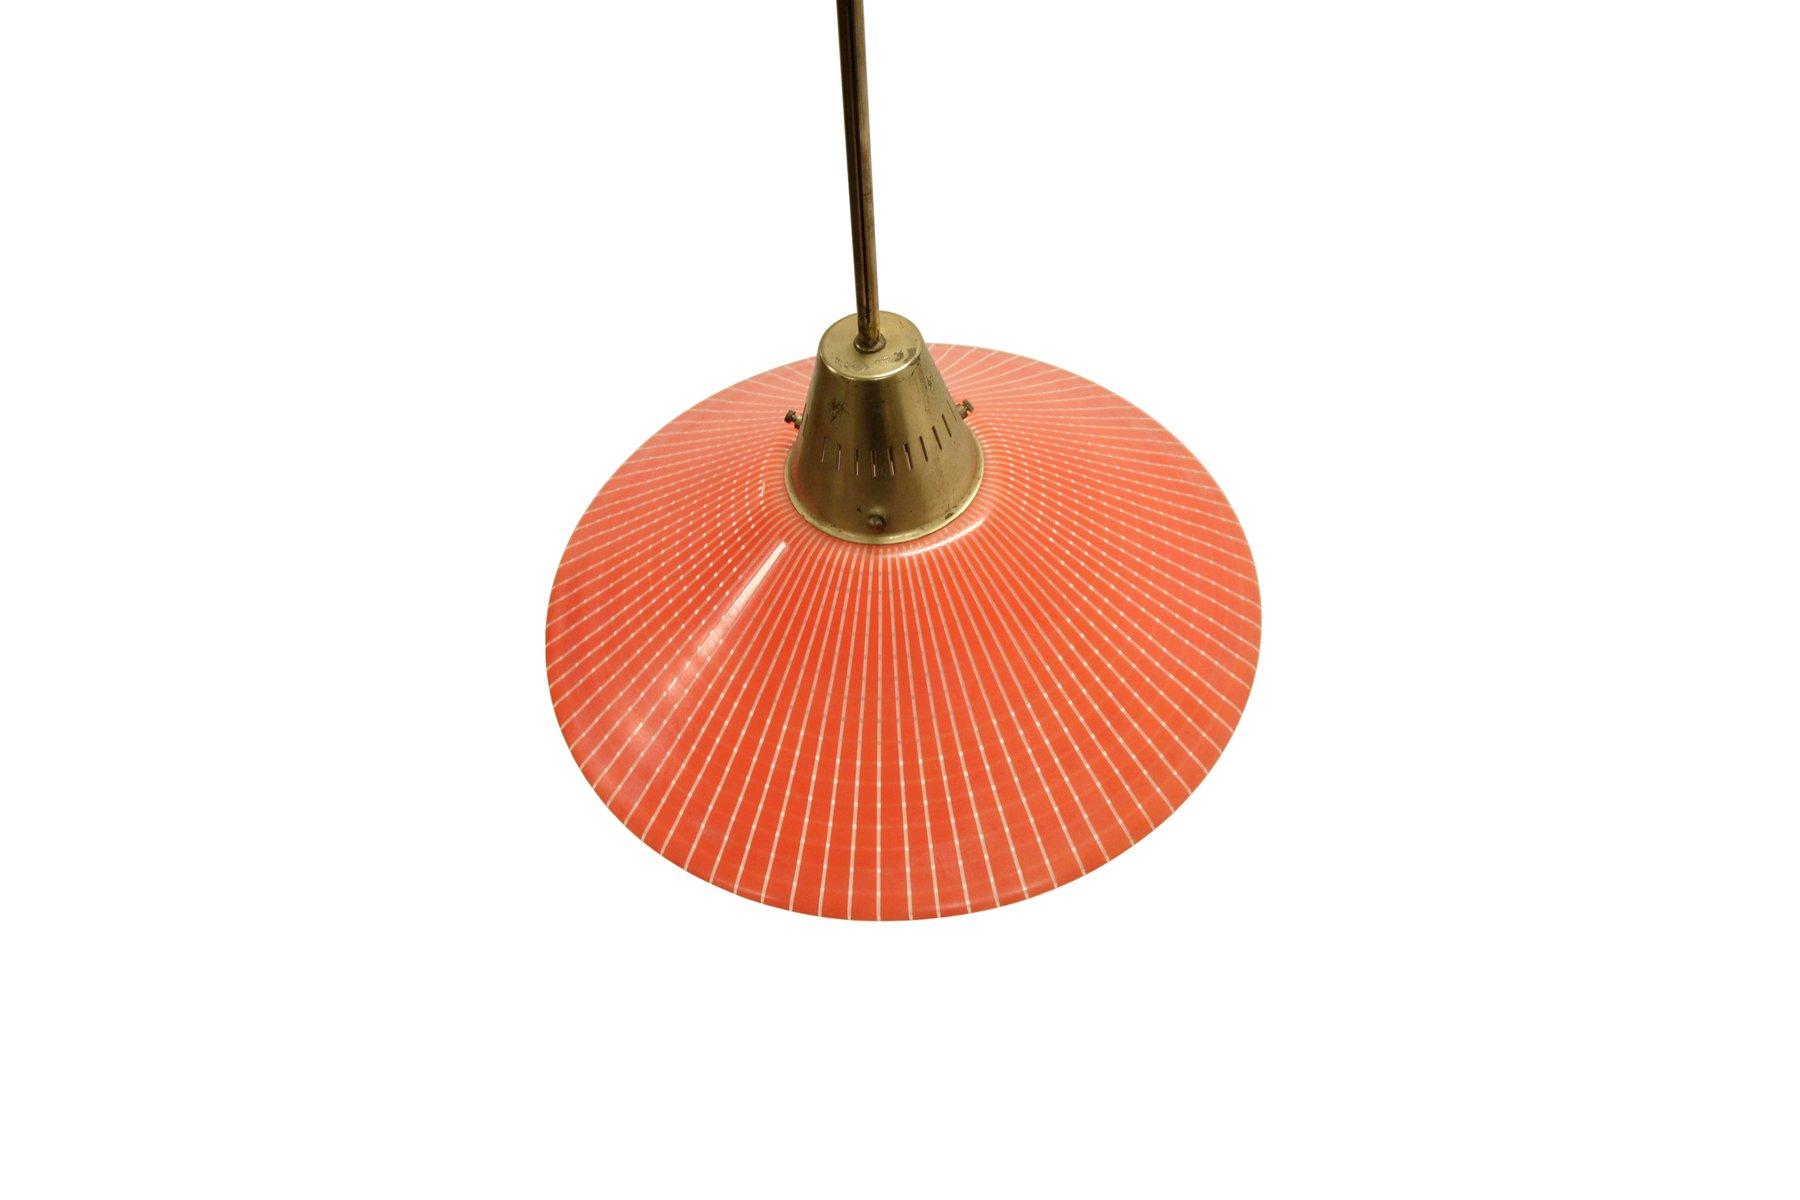 lampe suspension style scandinave de tr co 1960s en vente sur pamono. Black Bedroom Furniture Sets. Home Design Ideas